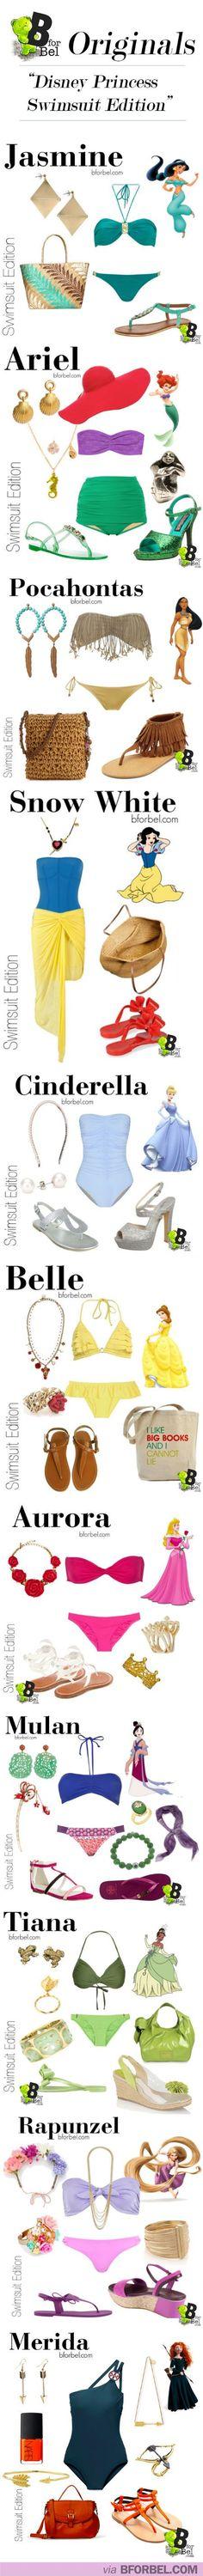 BforBel Originals: Disney Princess Swimsuit Edition